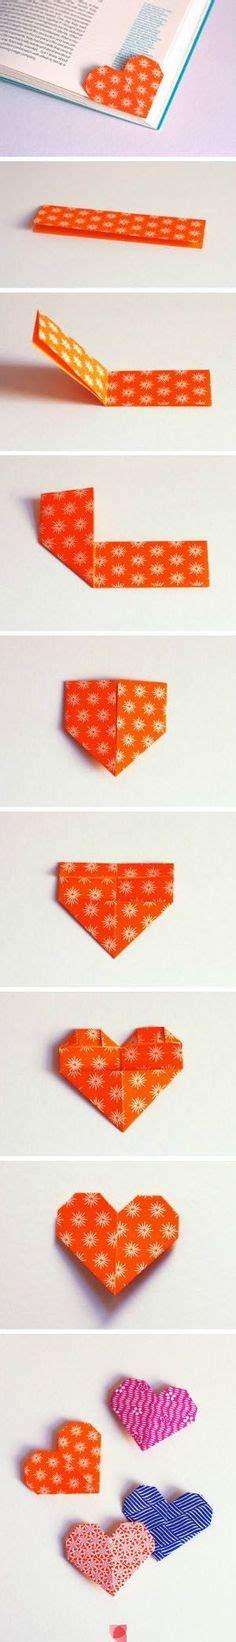 Origami Page Marker - azules manualidades faciles